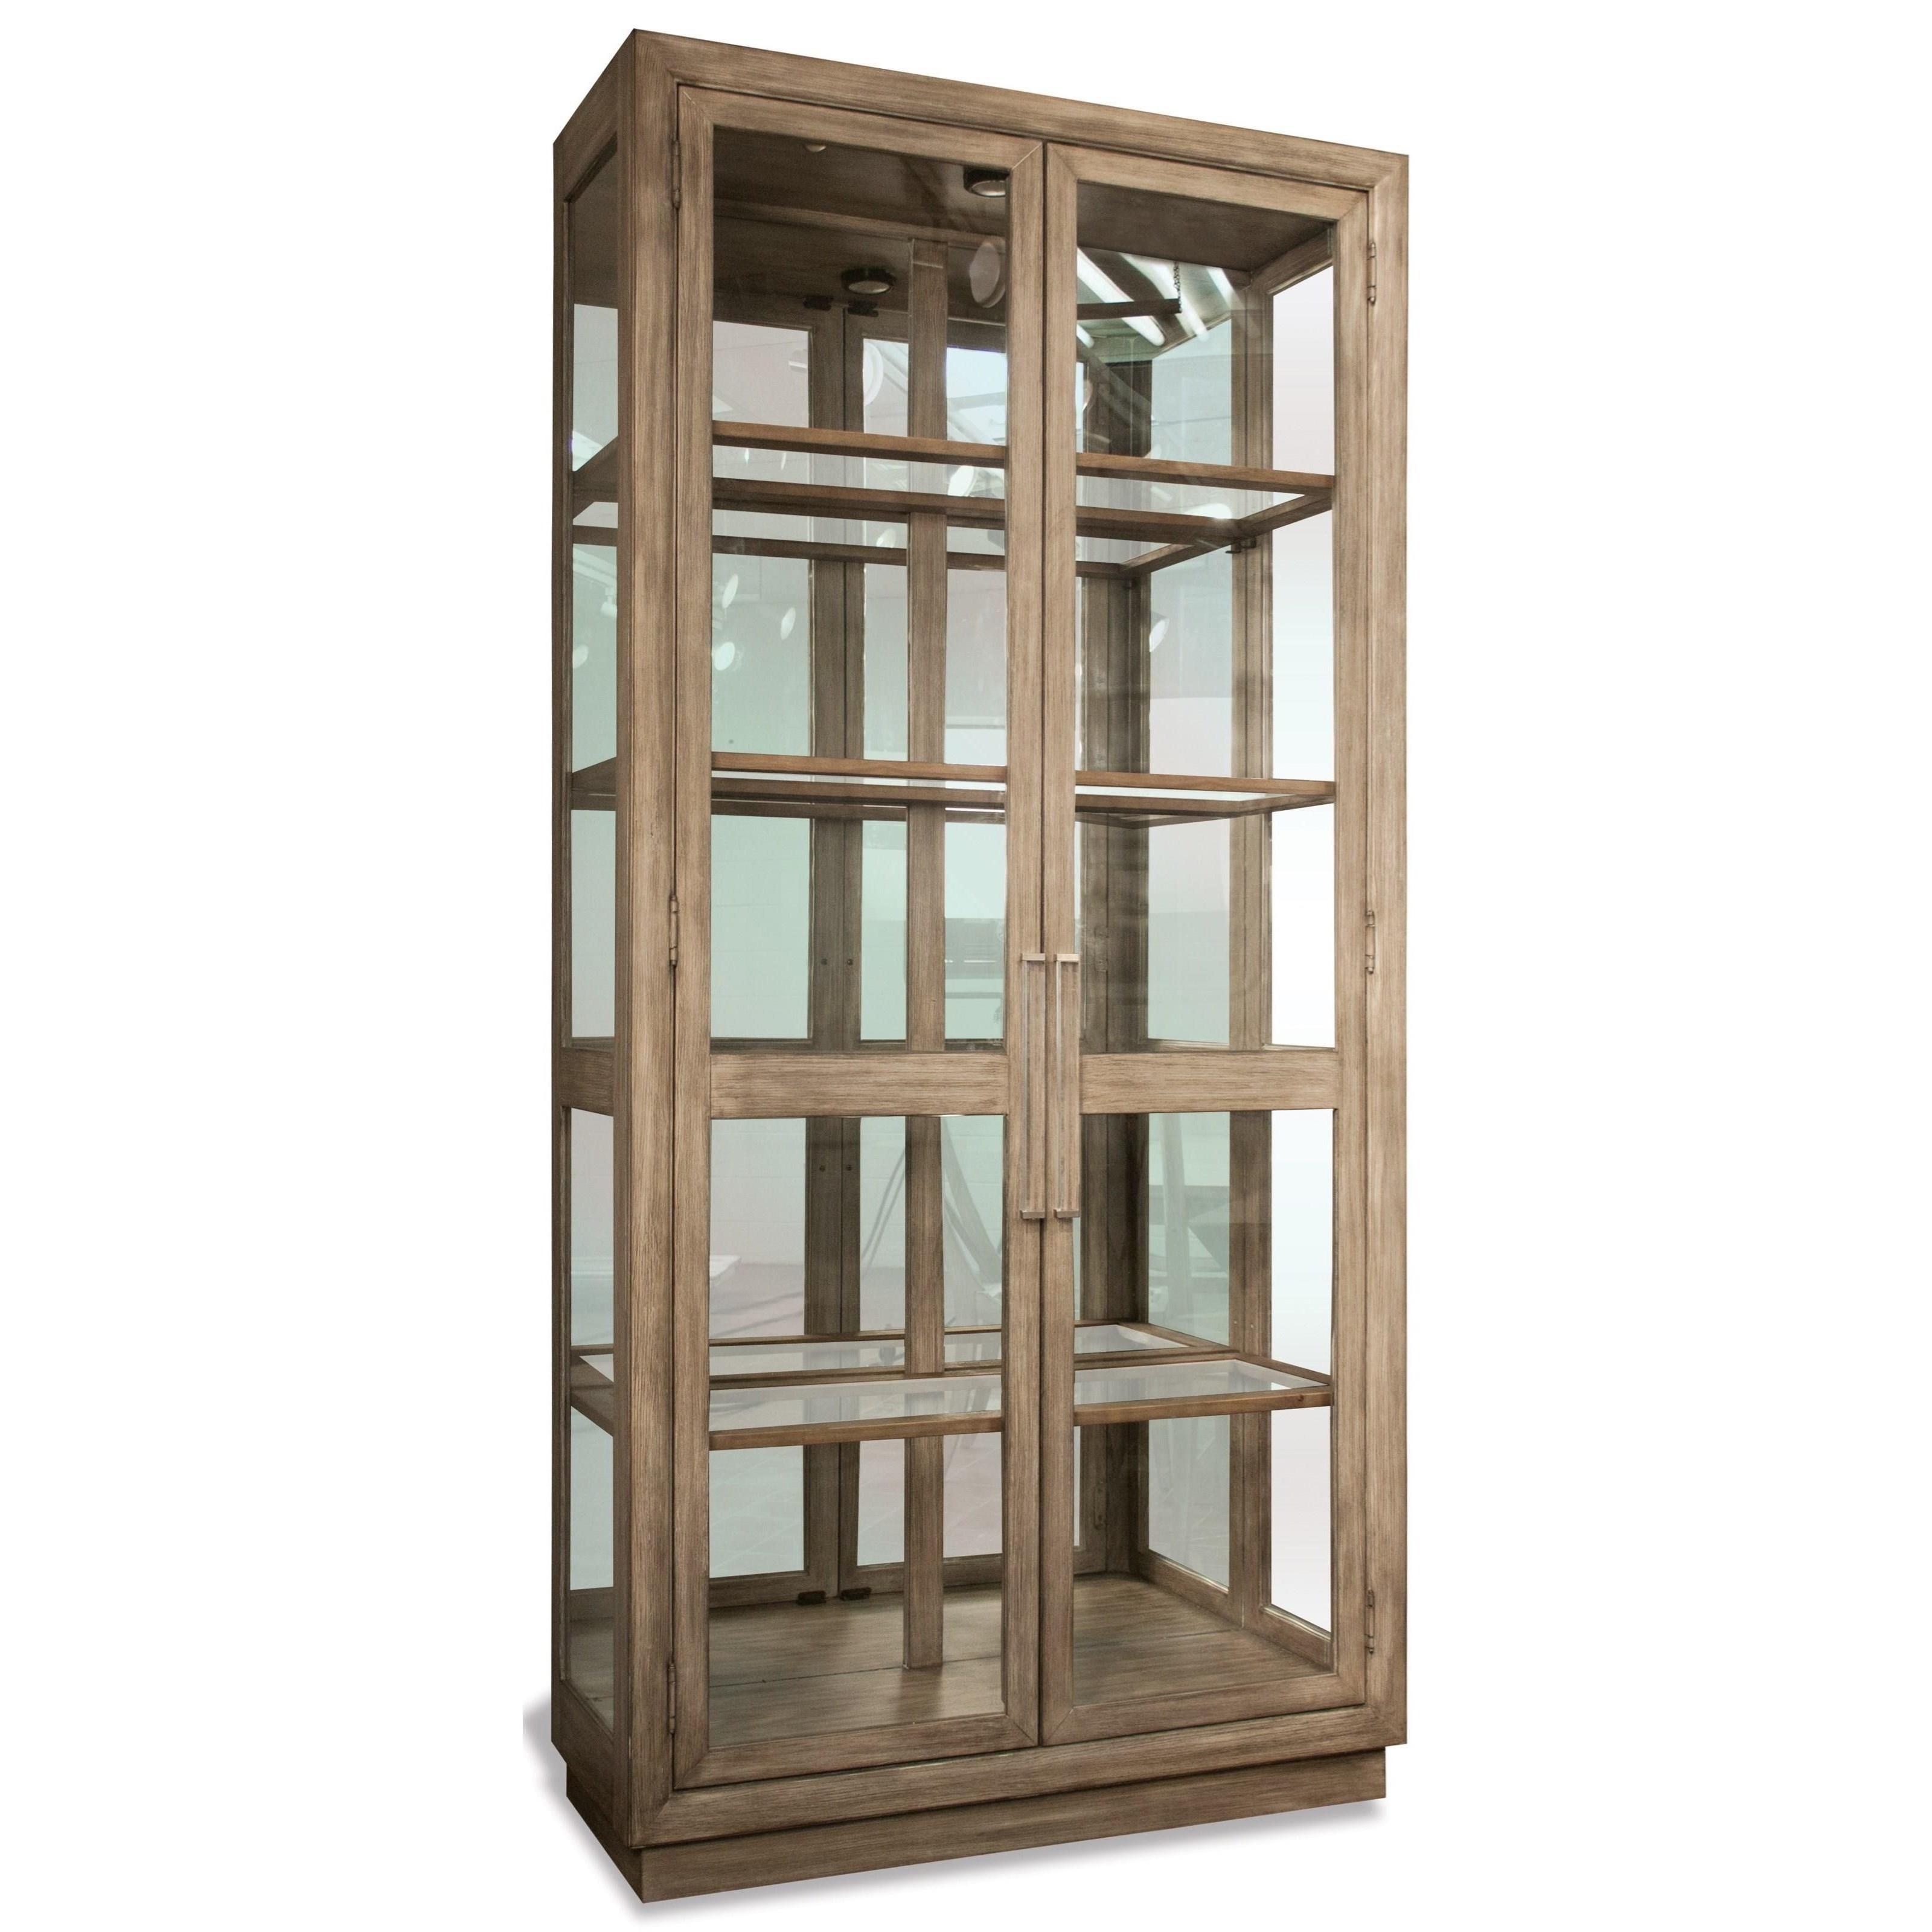 Stephanie Stephanie Display Cabinet by Riverside Furniture at Morris Home